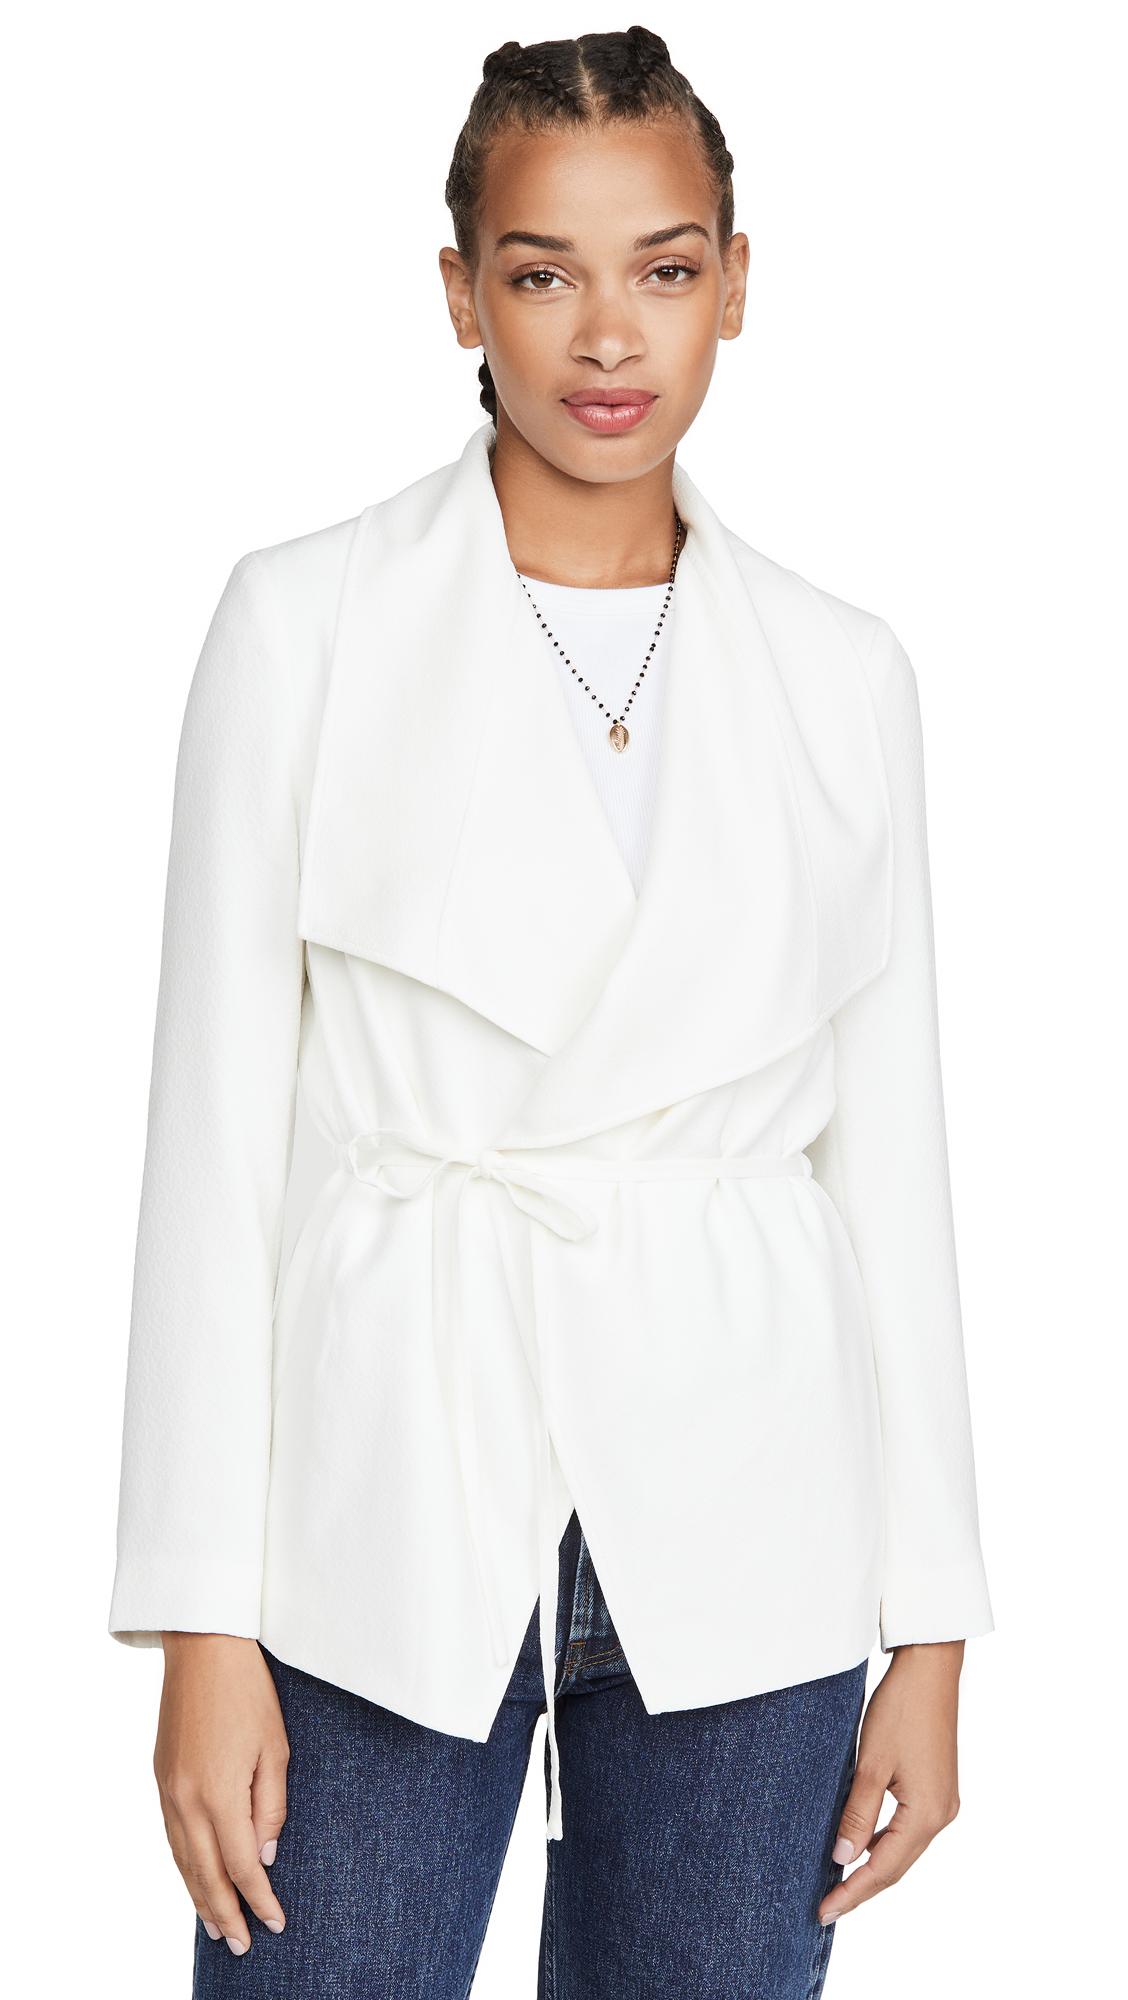 Buy Club Monaco Cadee Jacket online beautiful Club Monaco Jackets, Coats, Trench Coats